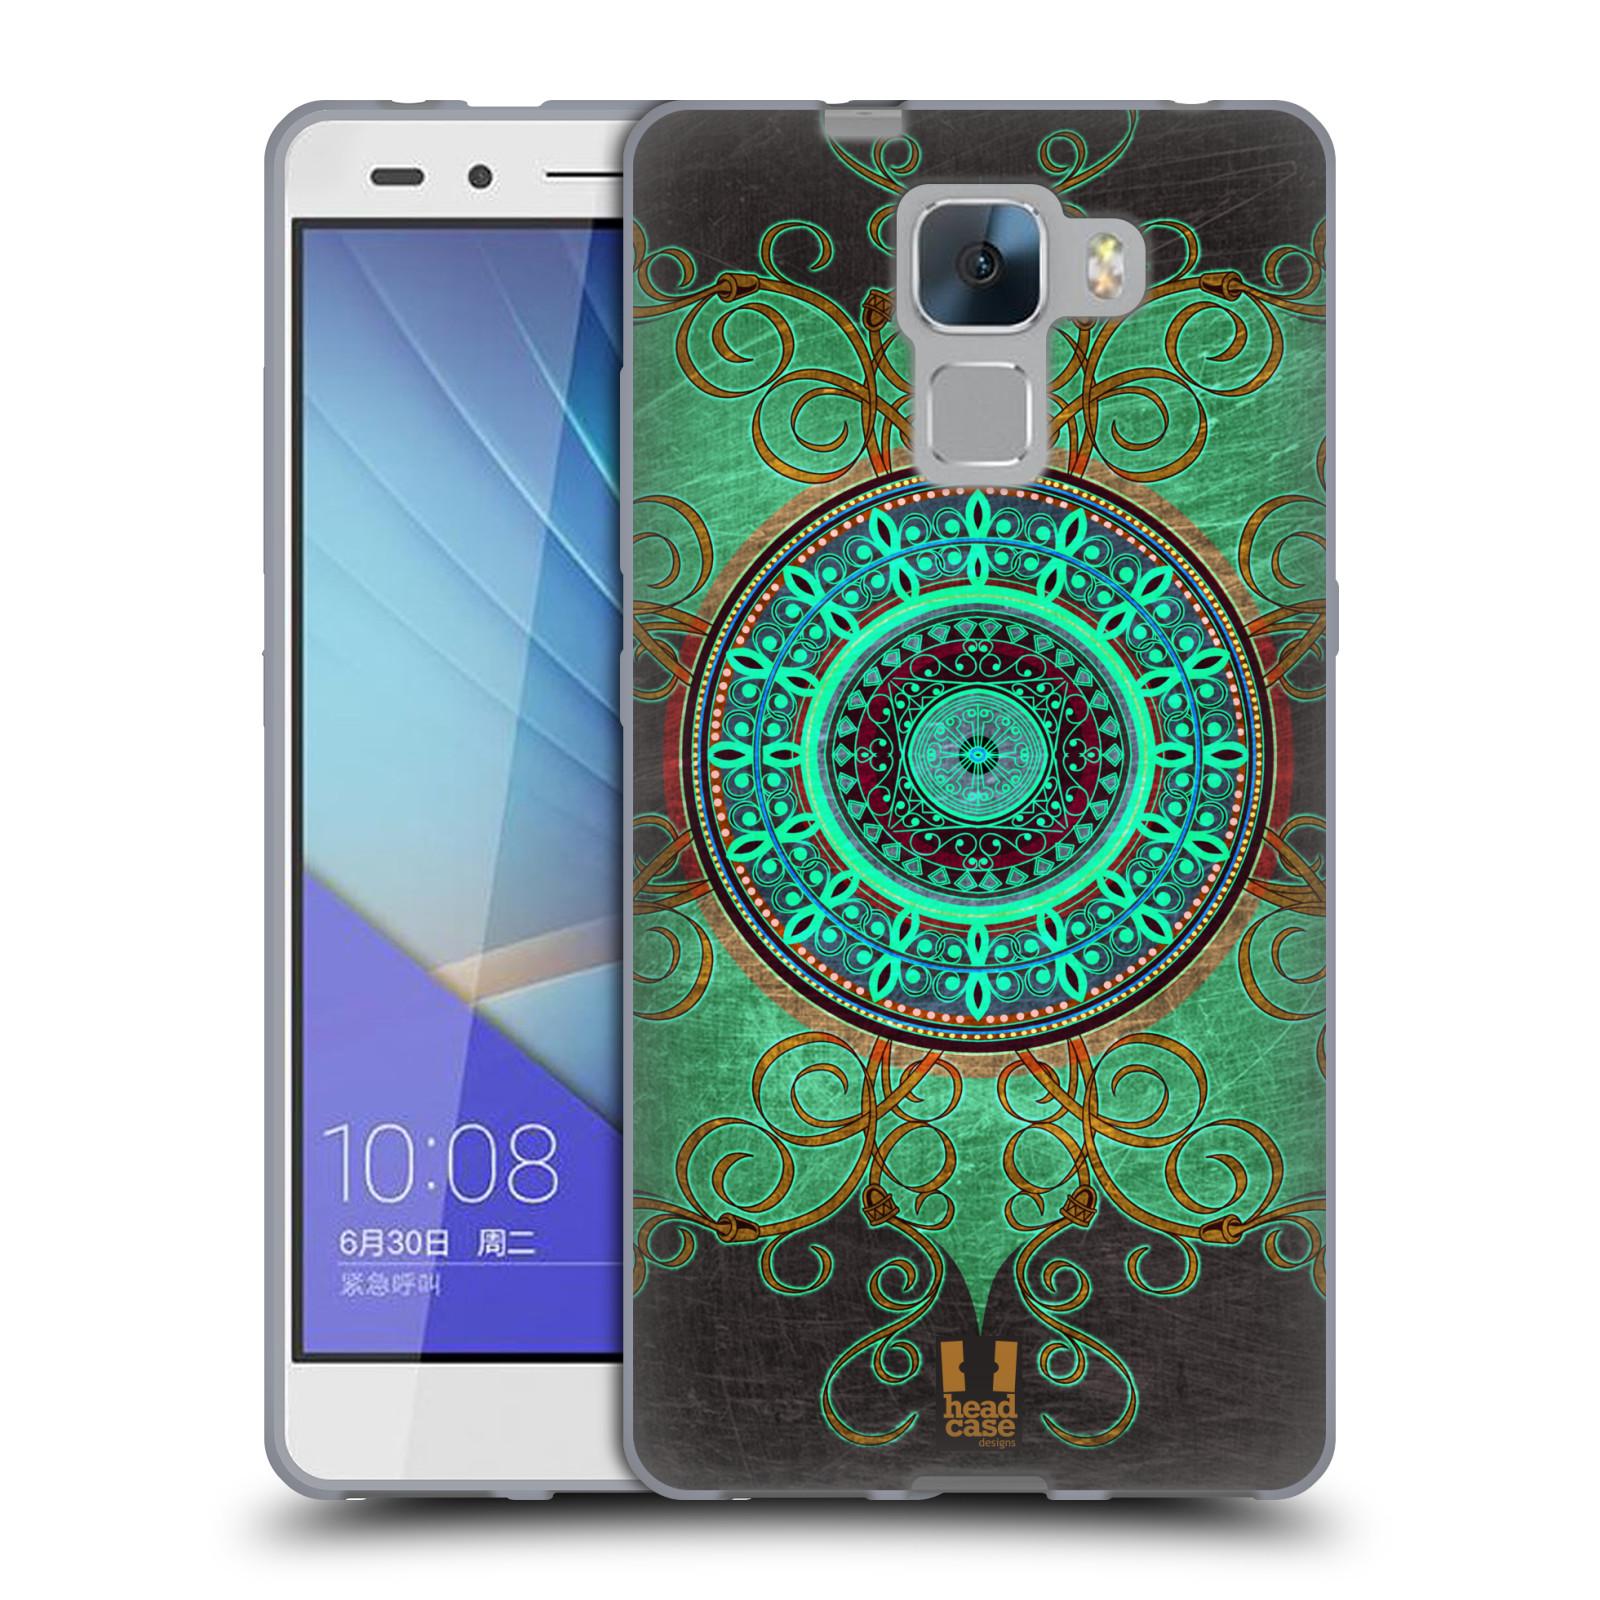 Silikonové pouzdro na mobil Honor 7 HEAD CASE ARAB MANDALA